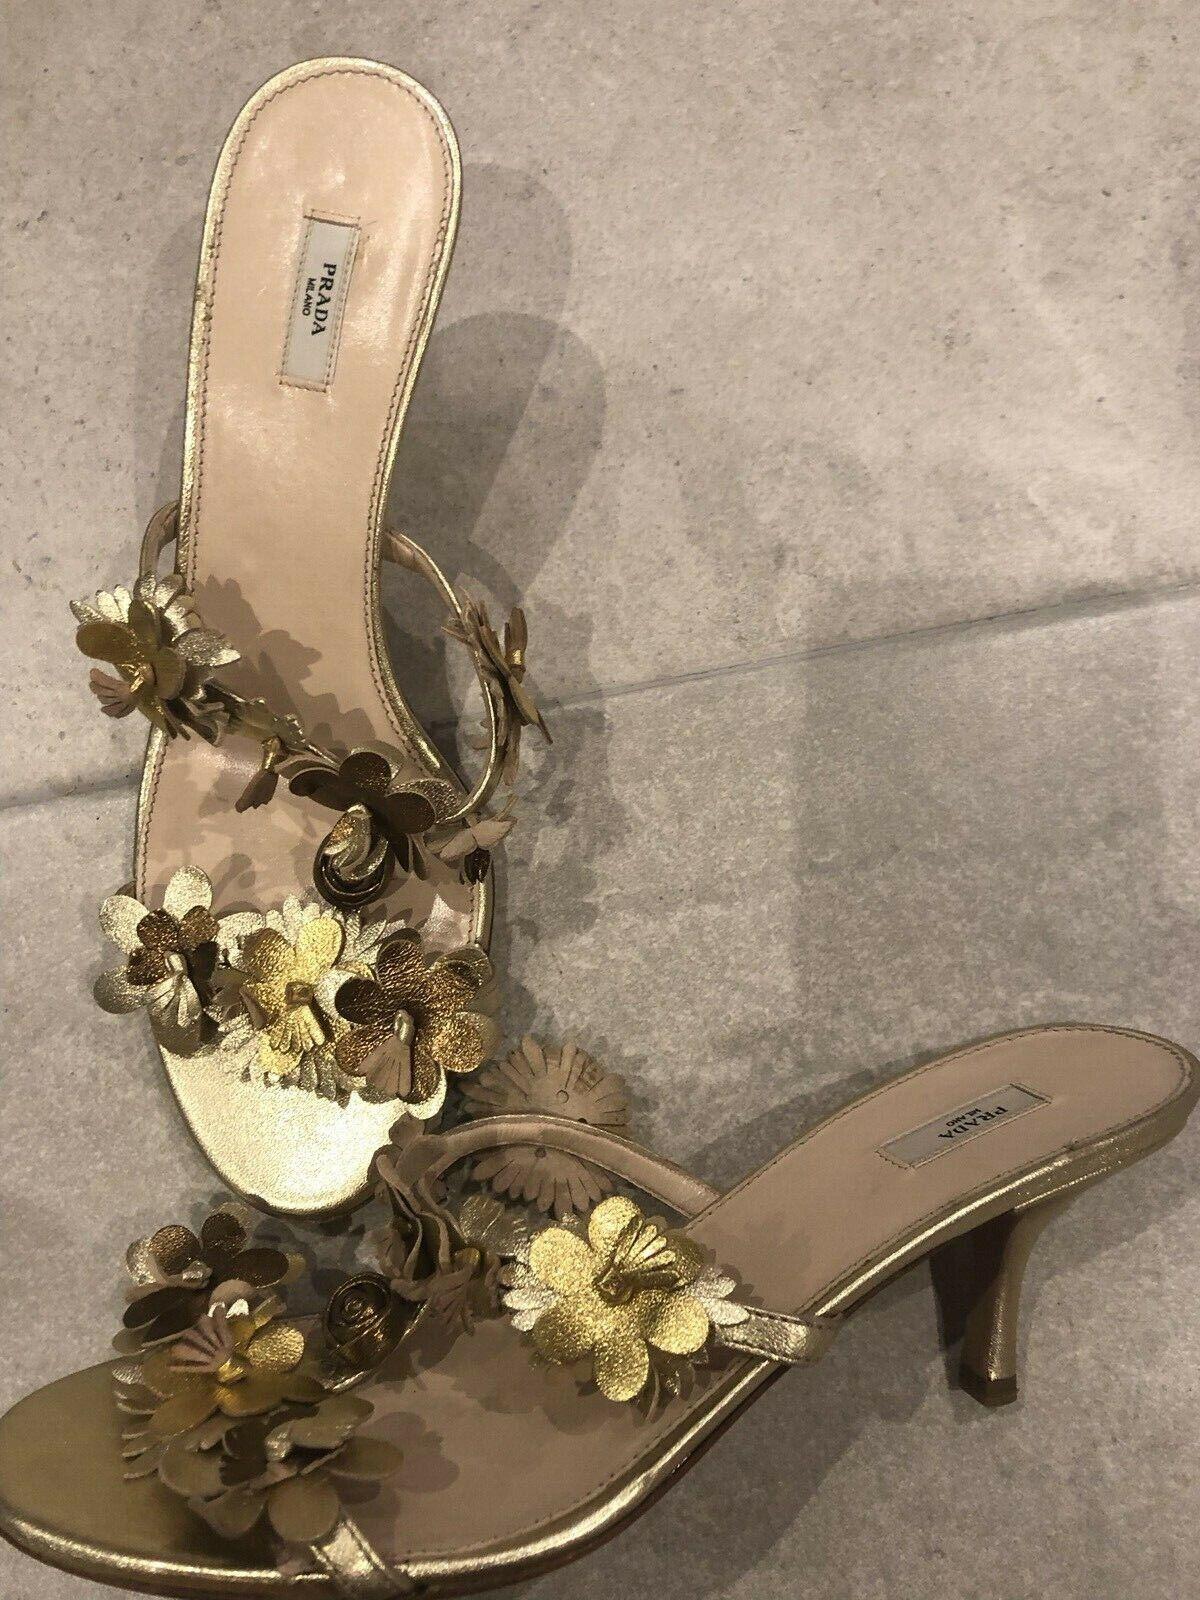 PRADA Leather Gold Flower Decorated Kitten Heel Mules schuhe 38 UK 5